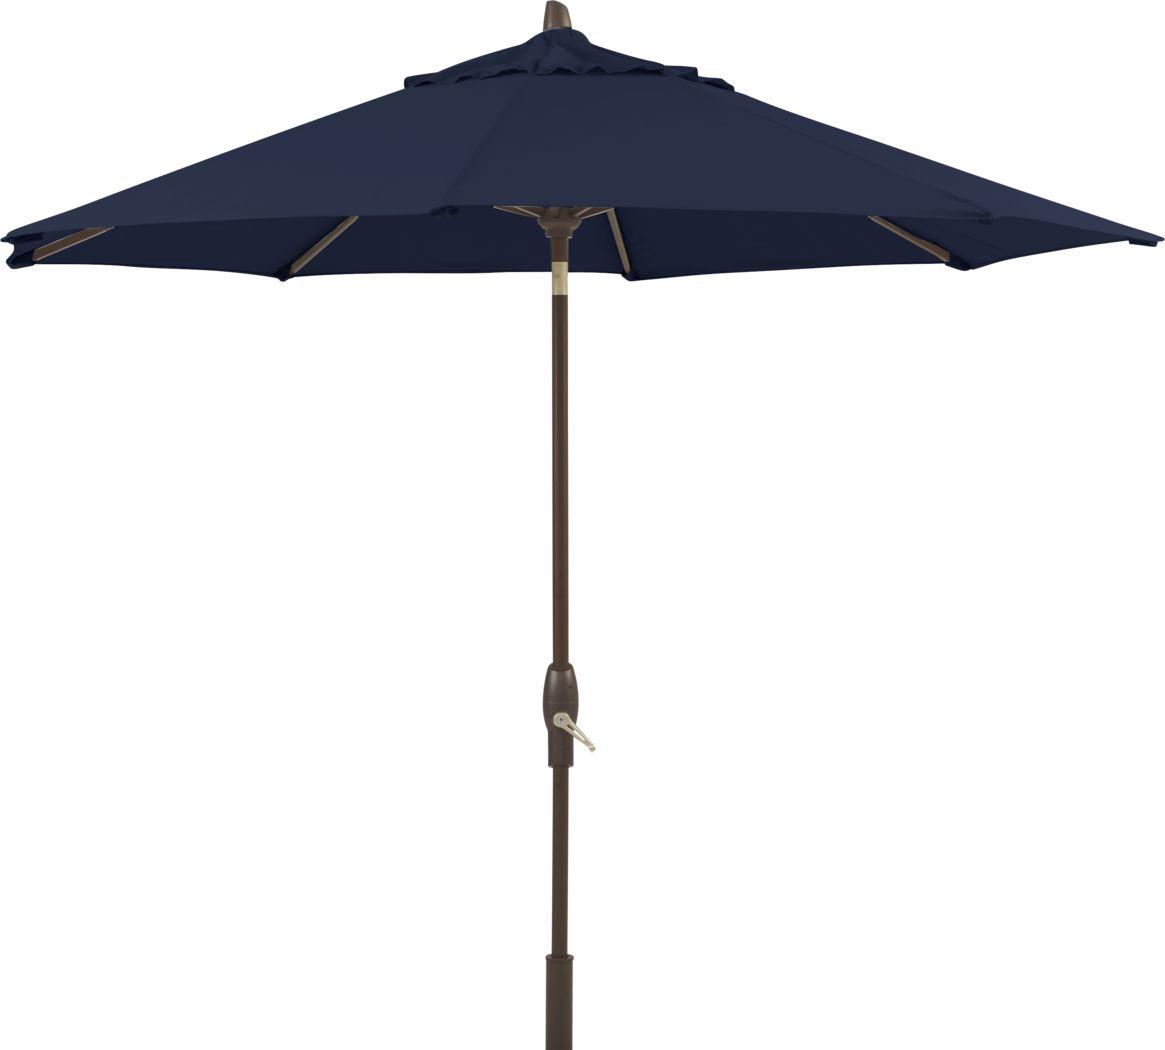 Seaport 9' Octagon Navy Outdoor Umbrella